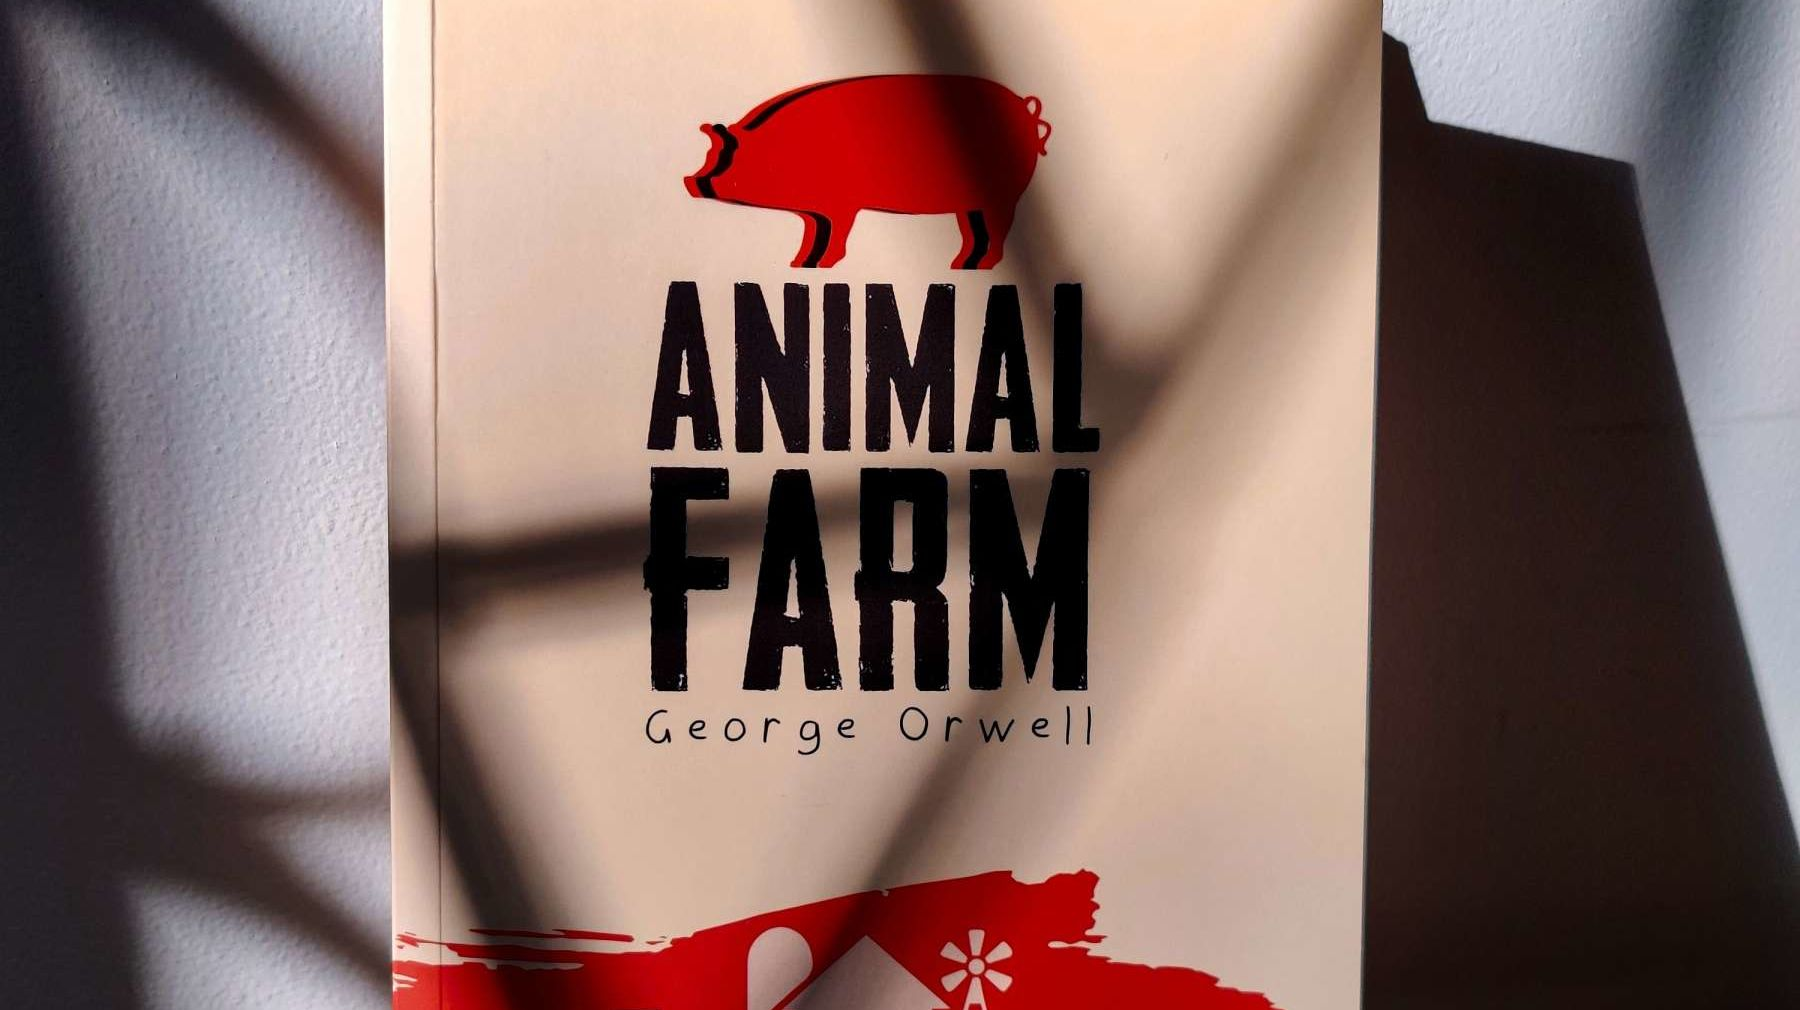 10 Facts About George Orwell's <em>Animal Farm</em>